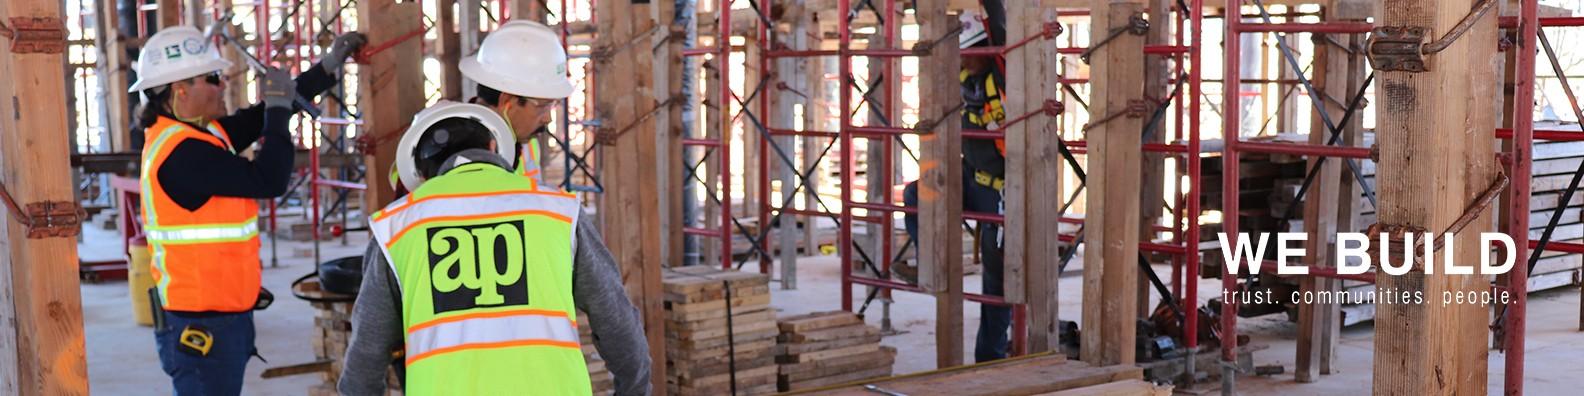 Adolfson & Peterson Construction: Jobs | LinkedIn